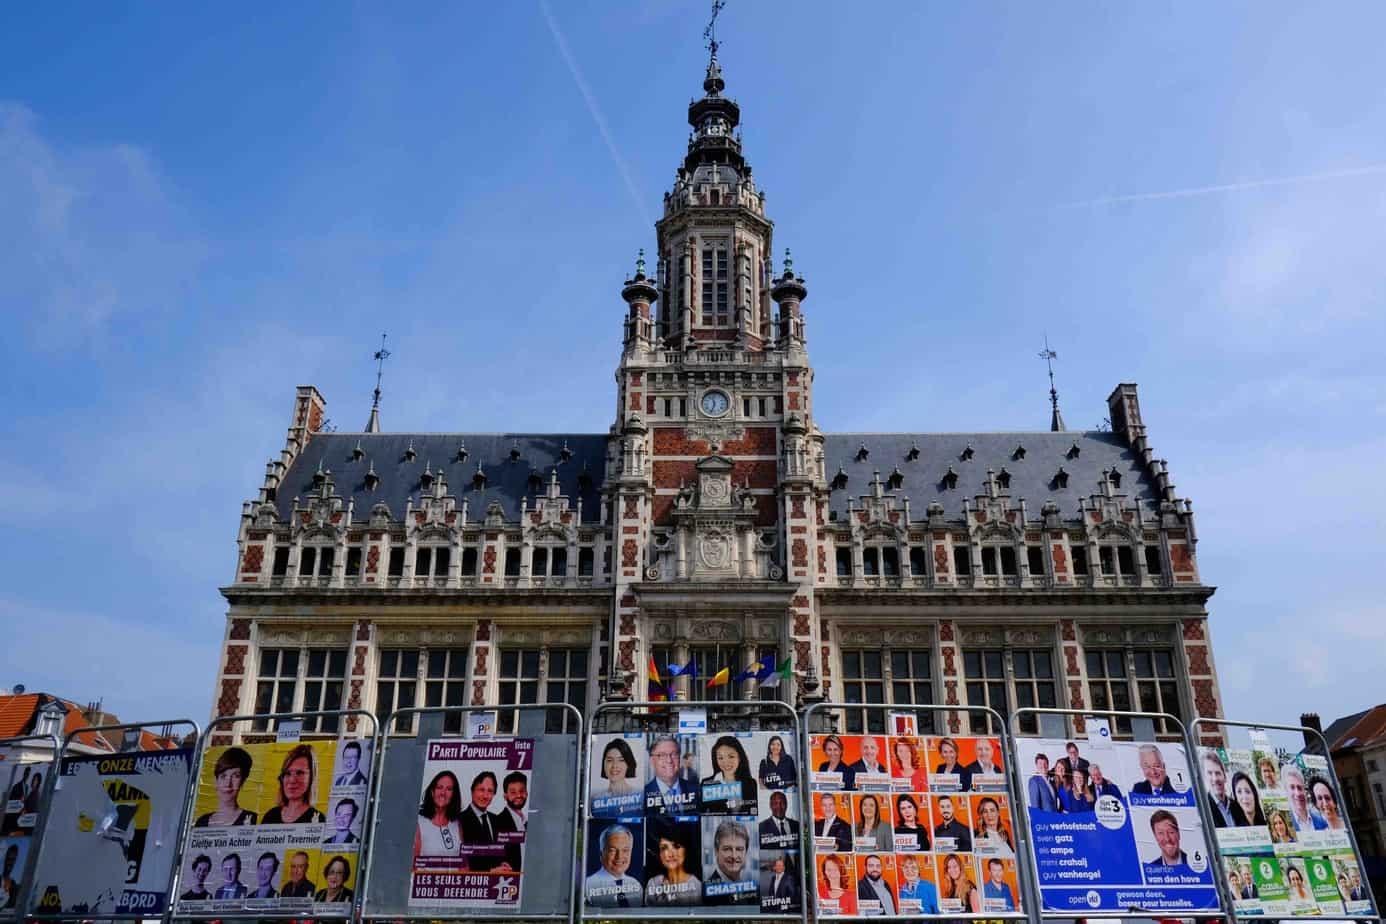 Belgium: a fragmented parliament